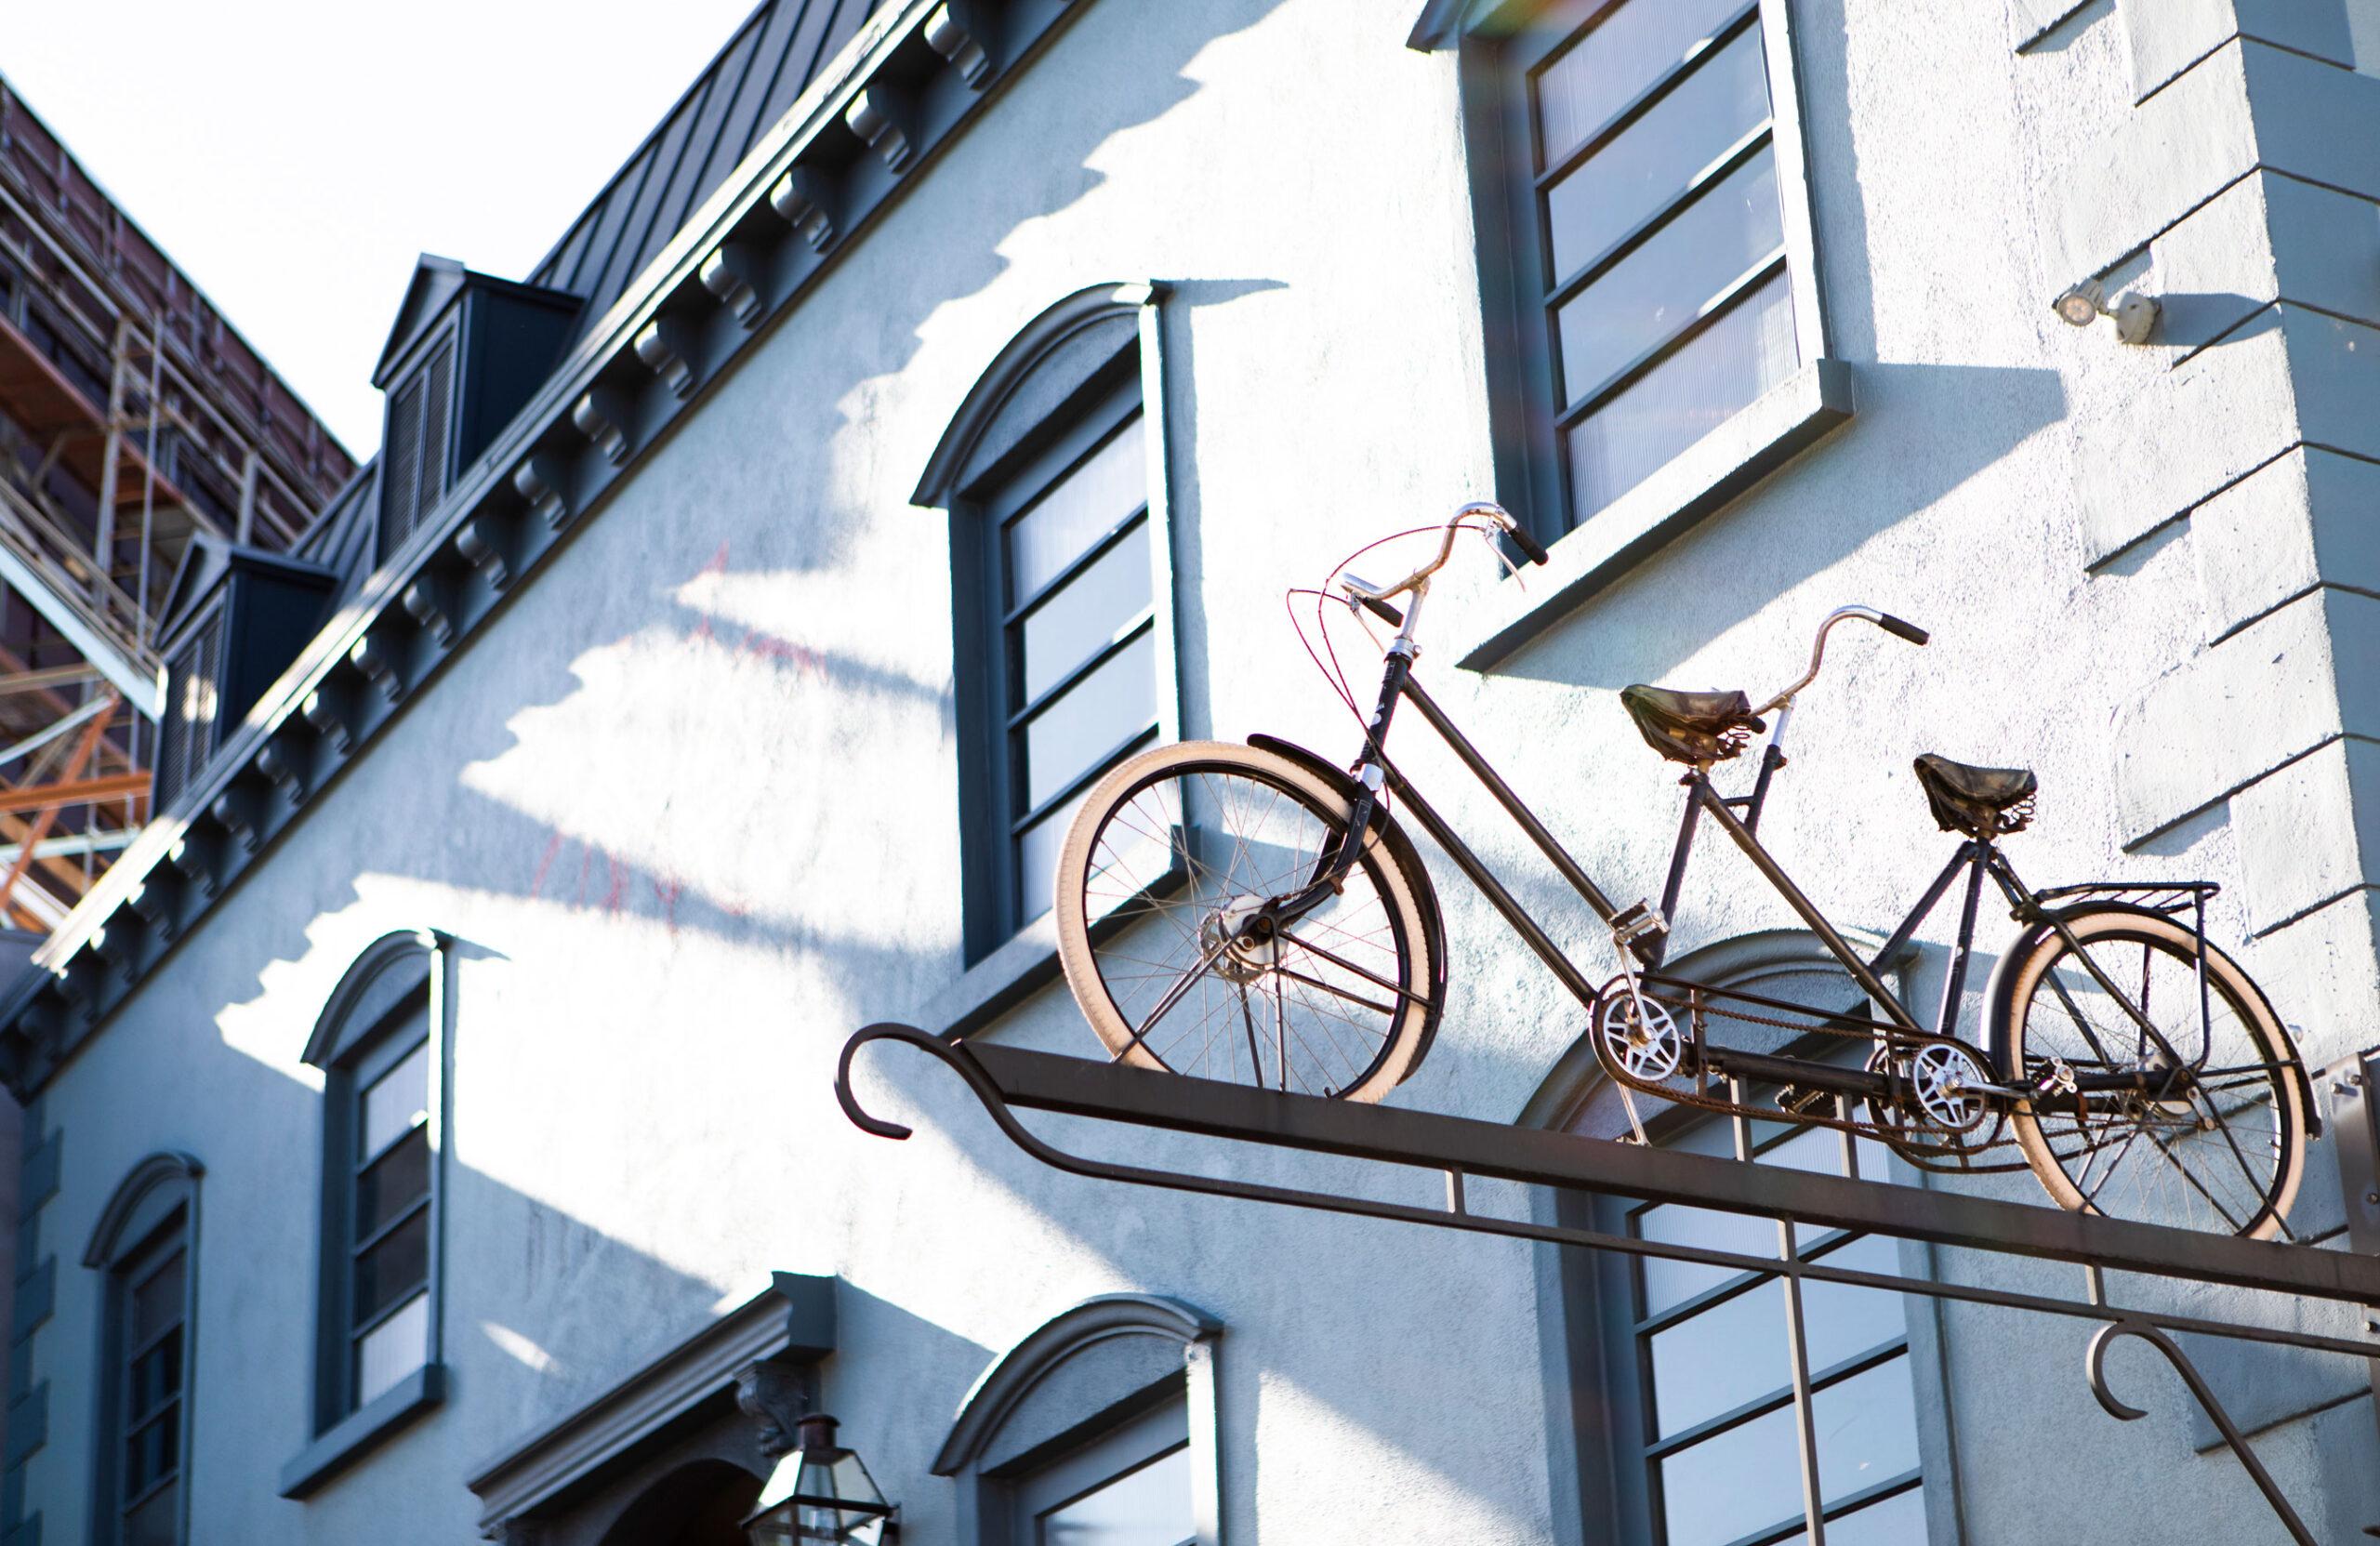 bicyclette-tandem-bike-exterior